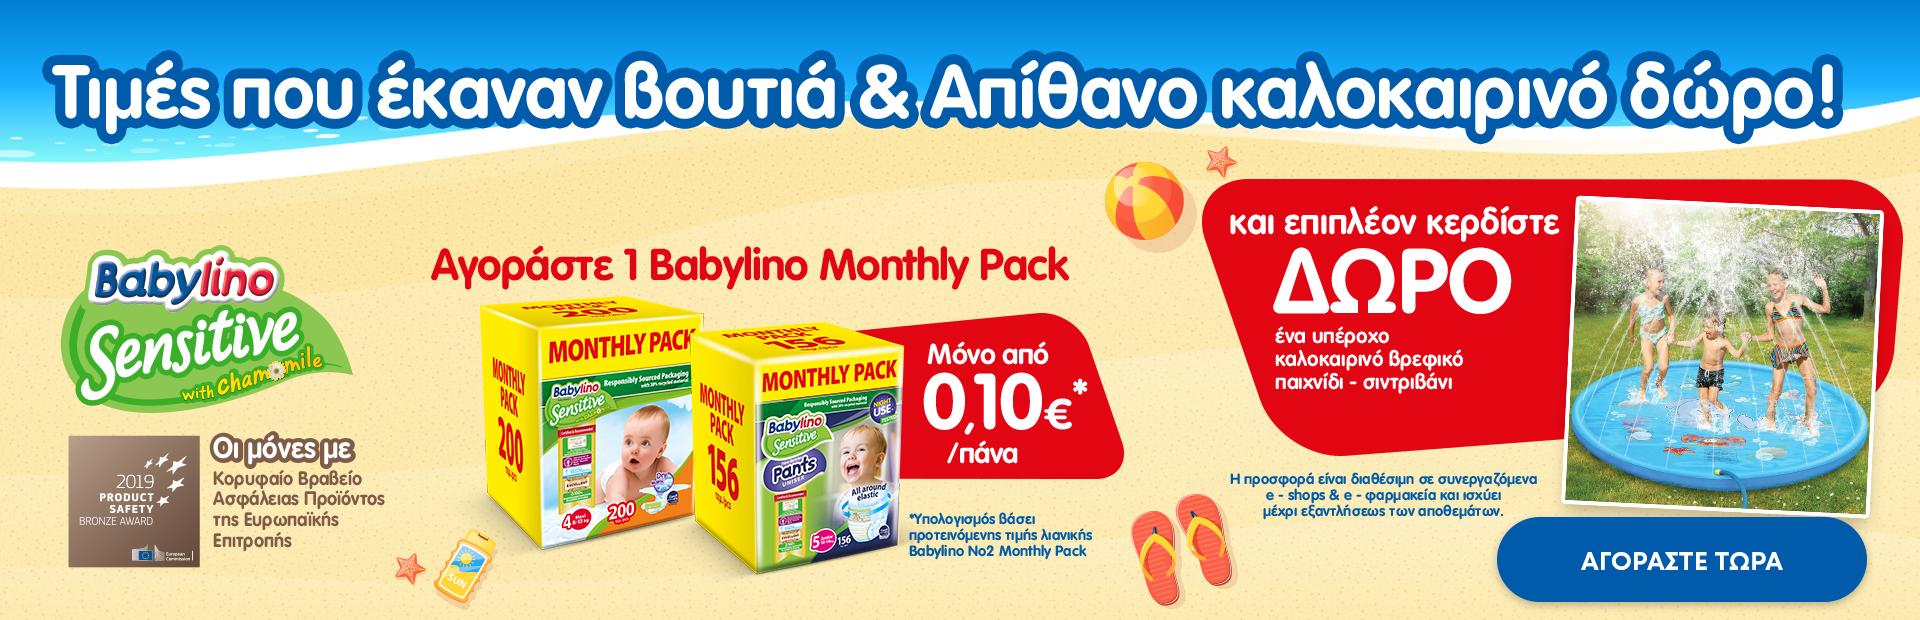 Babylino promo offers